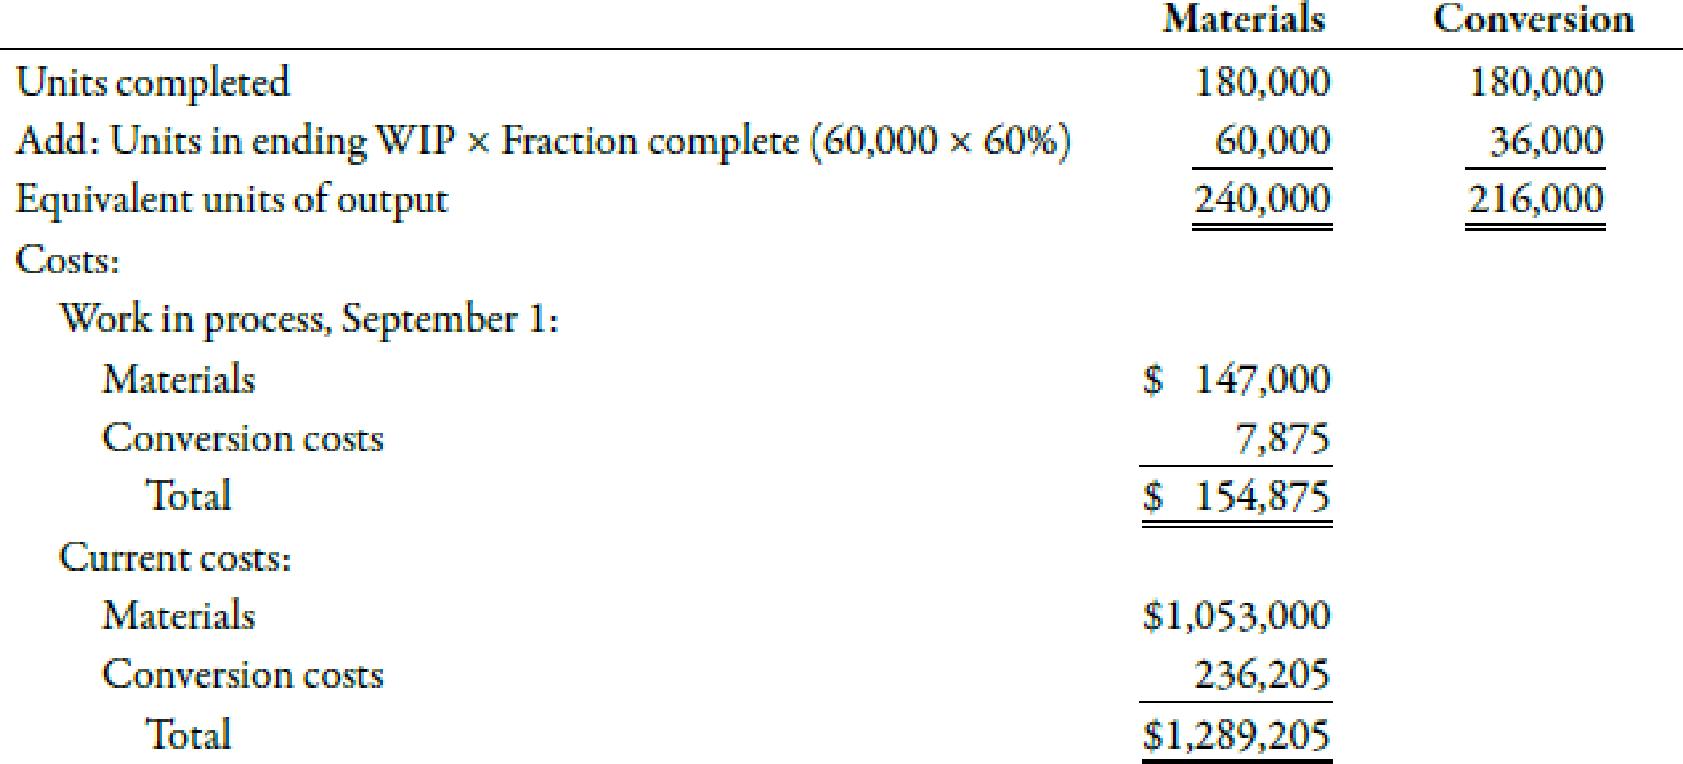 Chapter 6, Problem 51E, Unit Cost and Cost Assignment, Nonuniform Inputs Loran Inc. had the following equivalent units